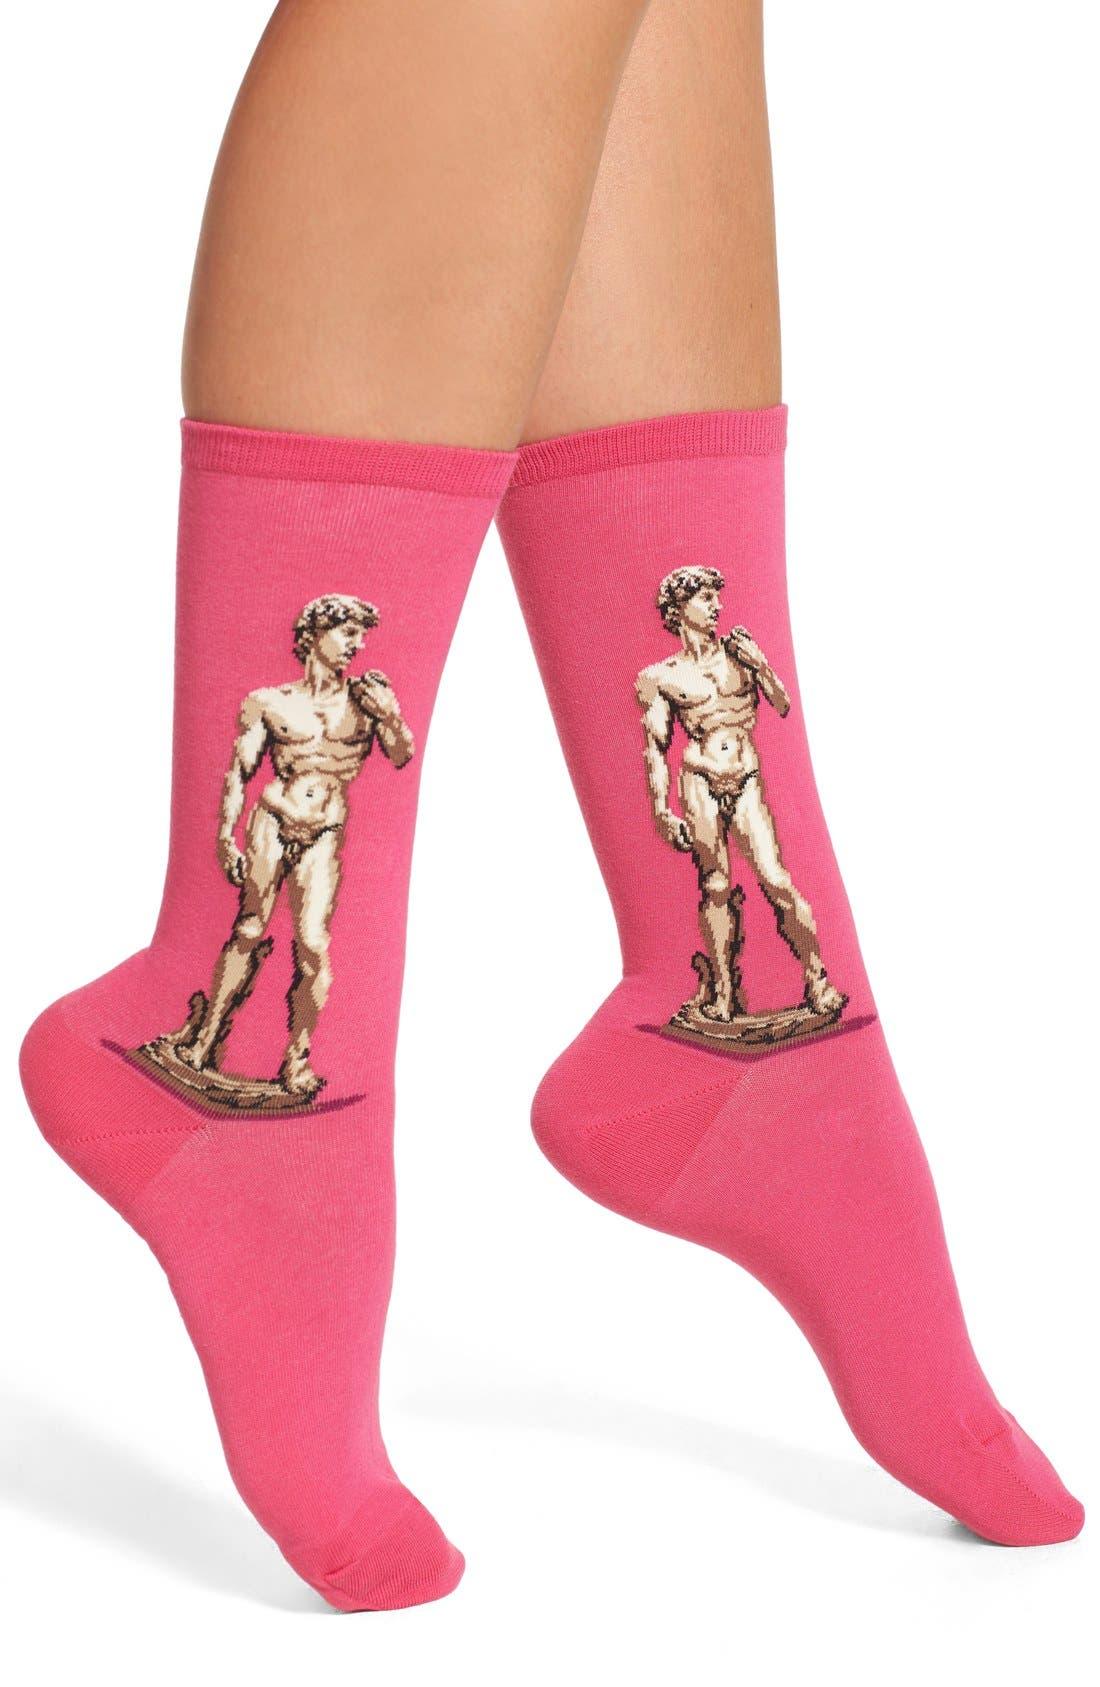 Hot Sox 'David' Crew Socks